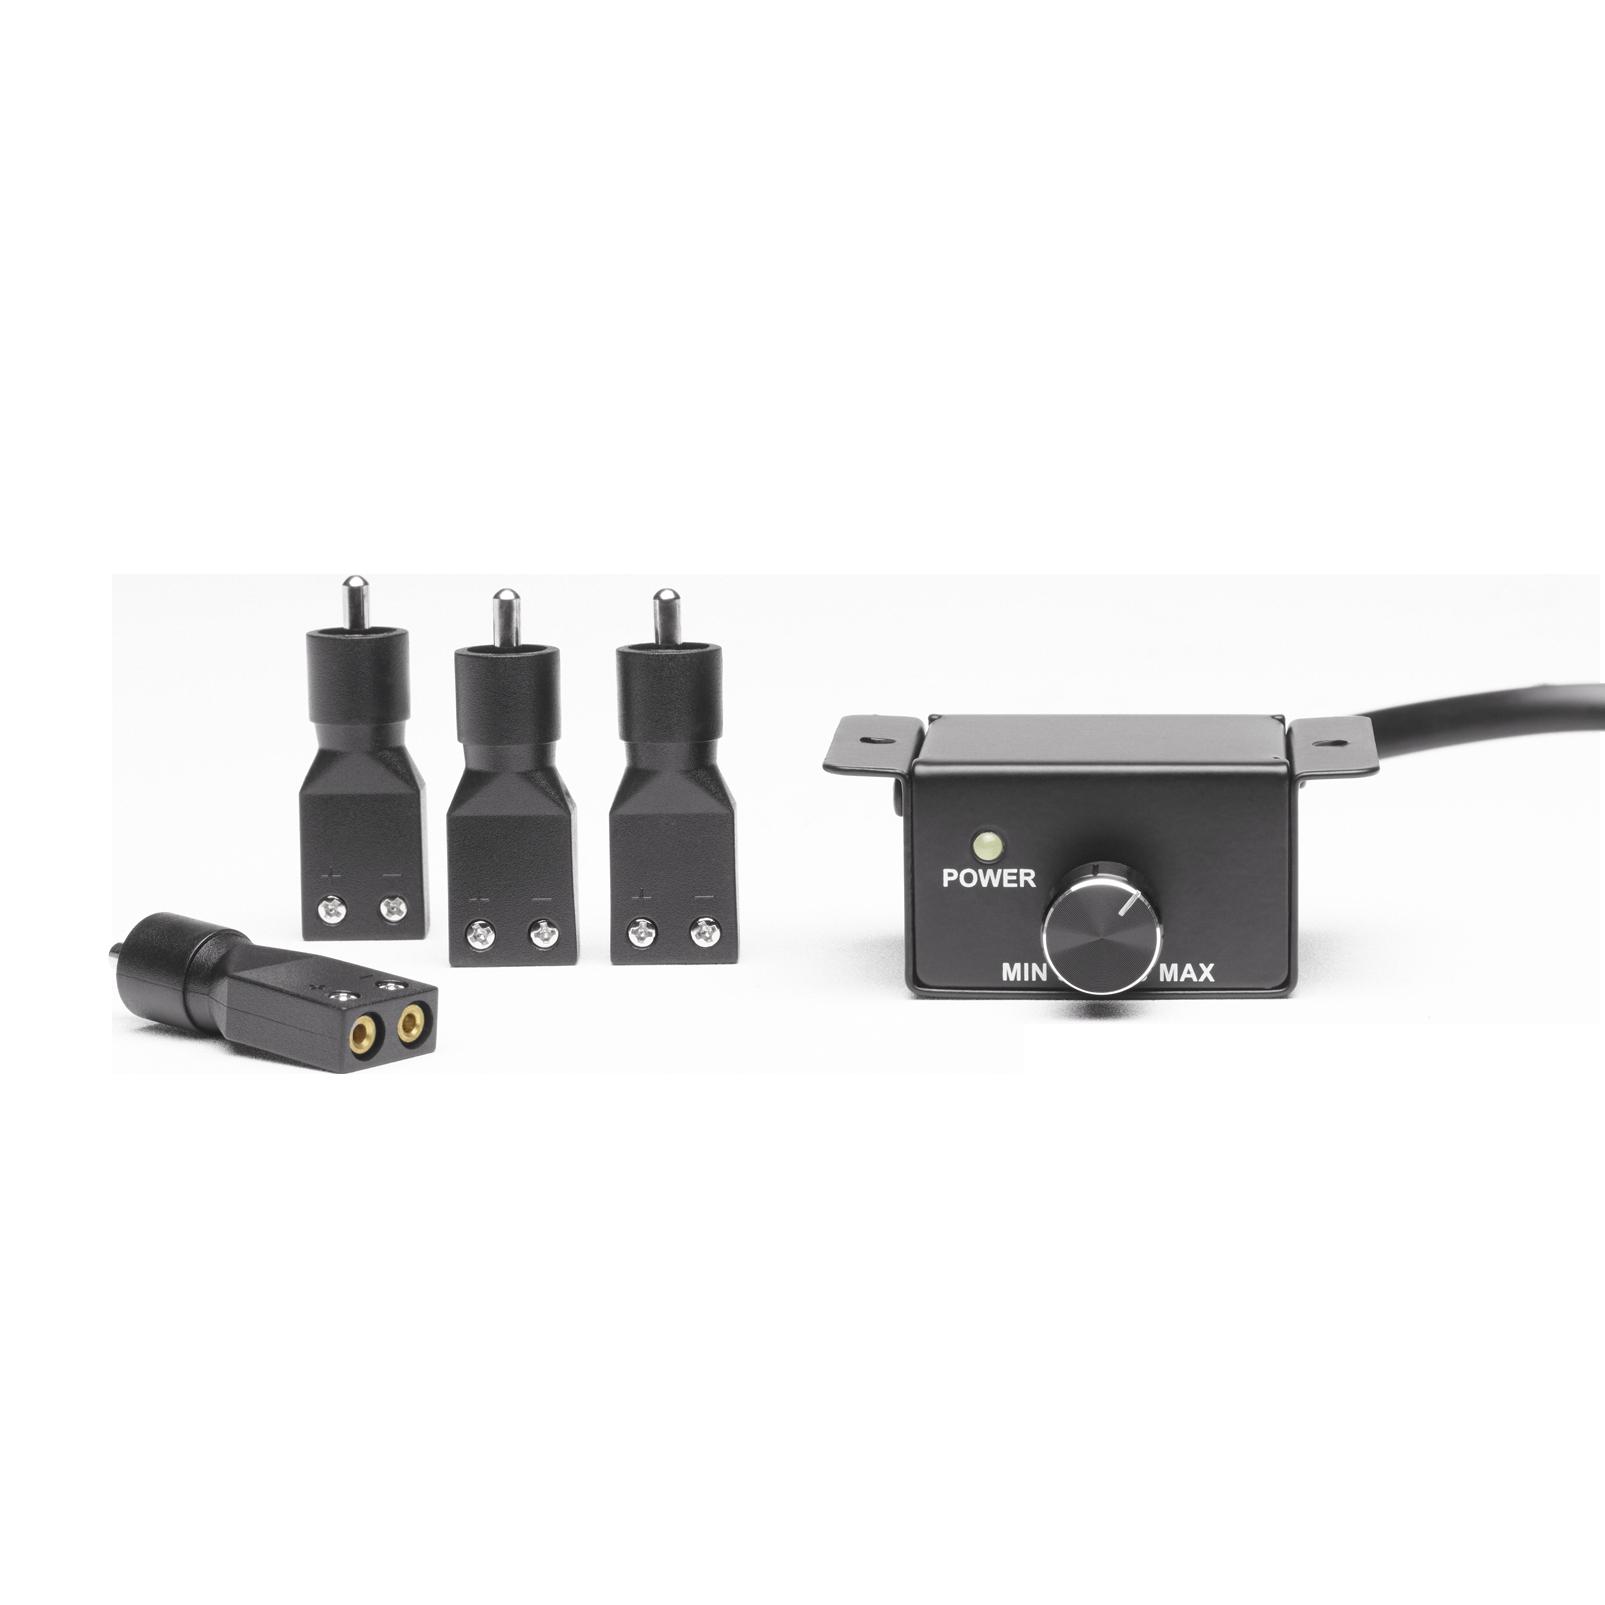 Reference 7005A - Black - High performance 5 channel car amplifier - Detailshot 1